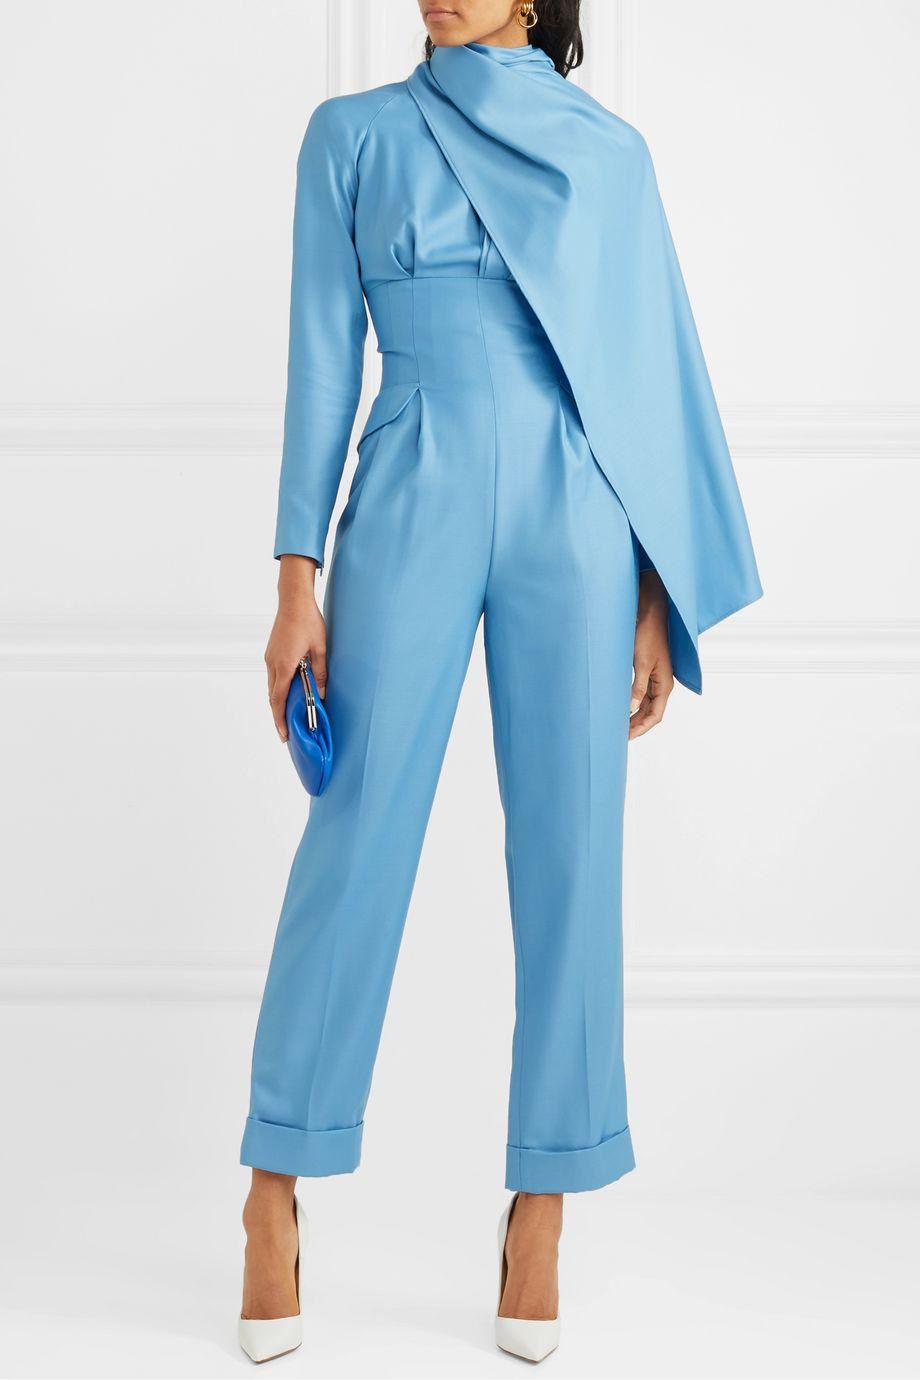 Emilia Wickstead Harley cape-effect wool-gabardine jumpsuit